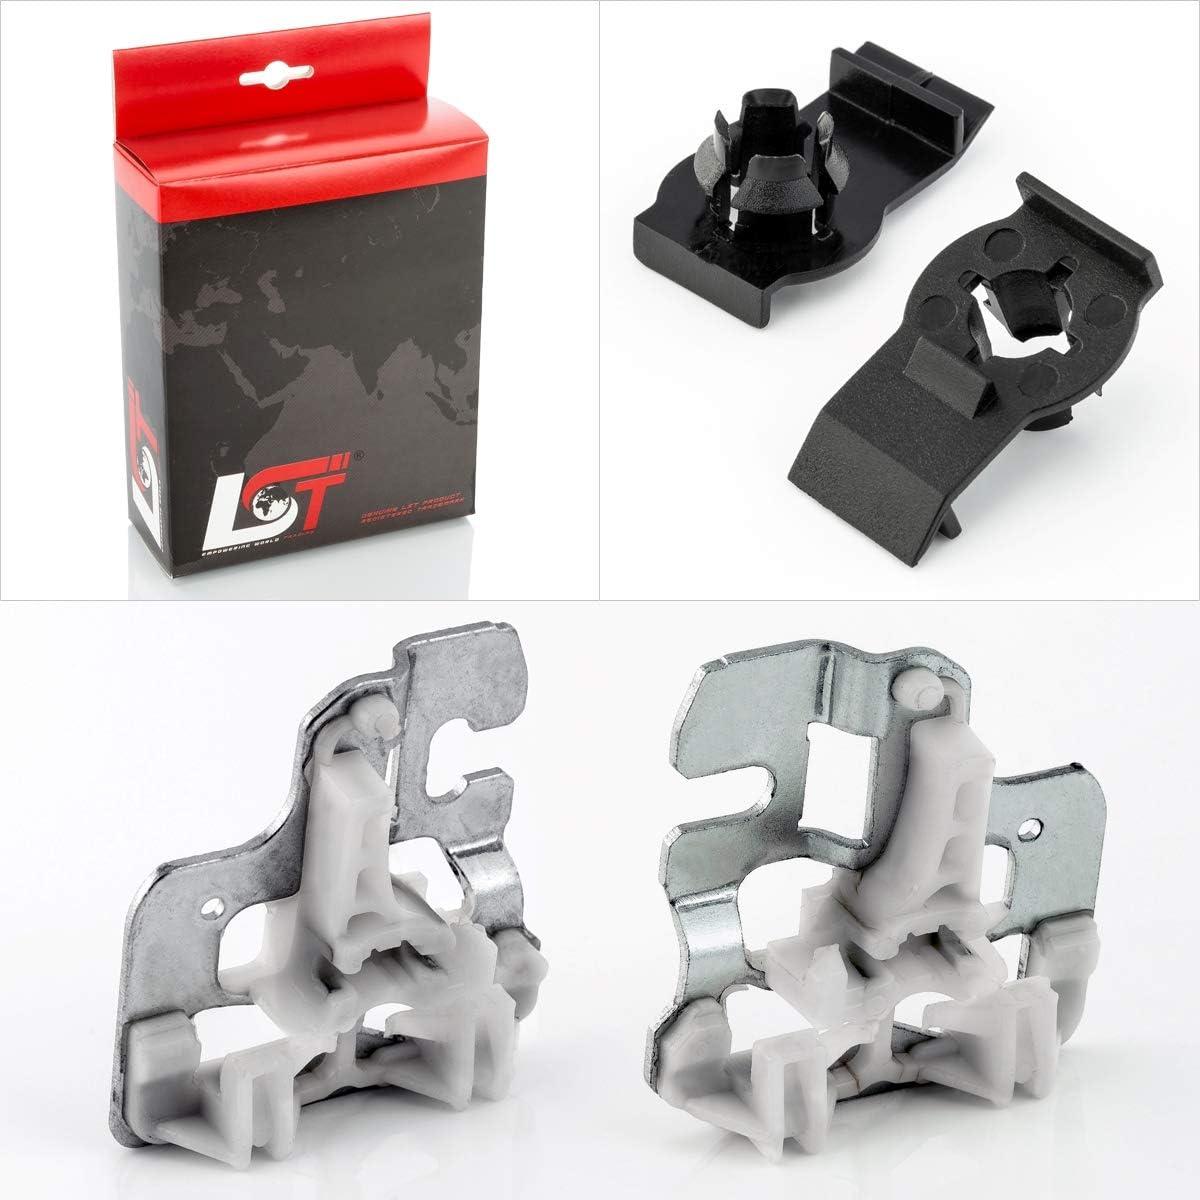 LST Fensterheber Reparatursatz Set Metall Gleitst/ücke Klammer VL//VR X5 E53